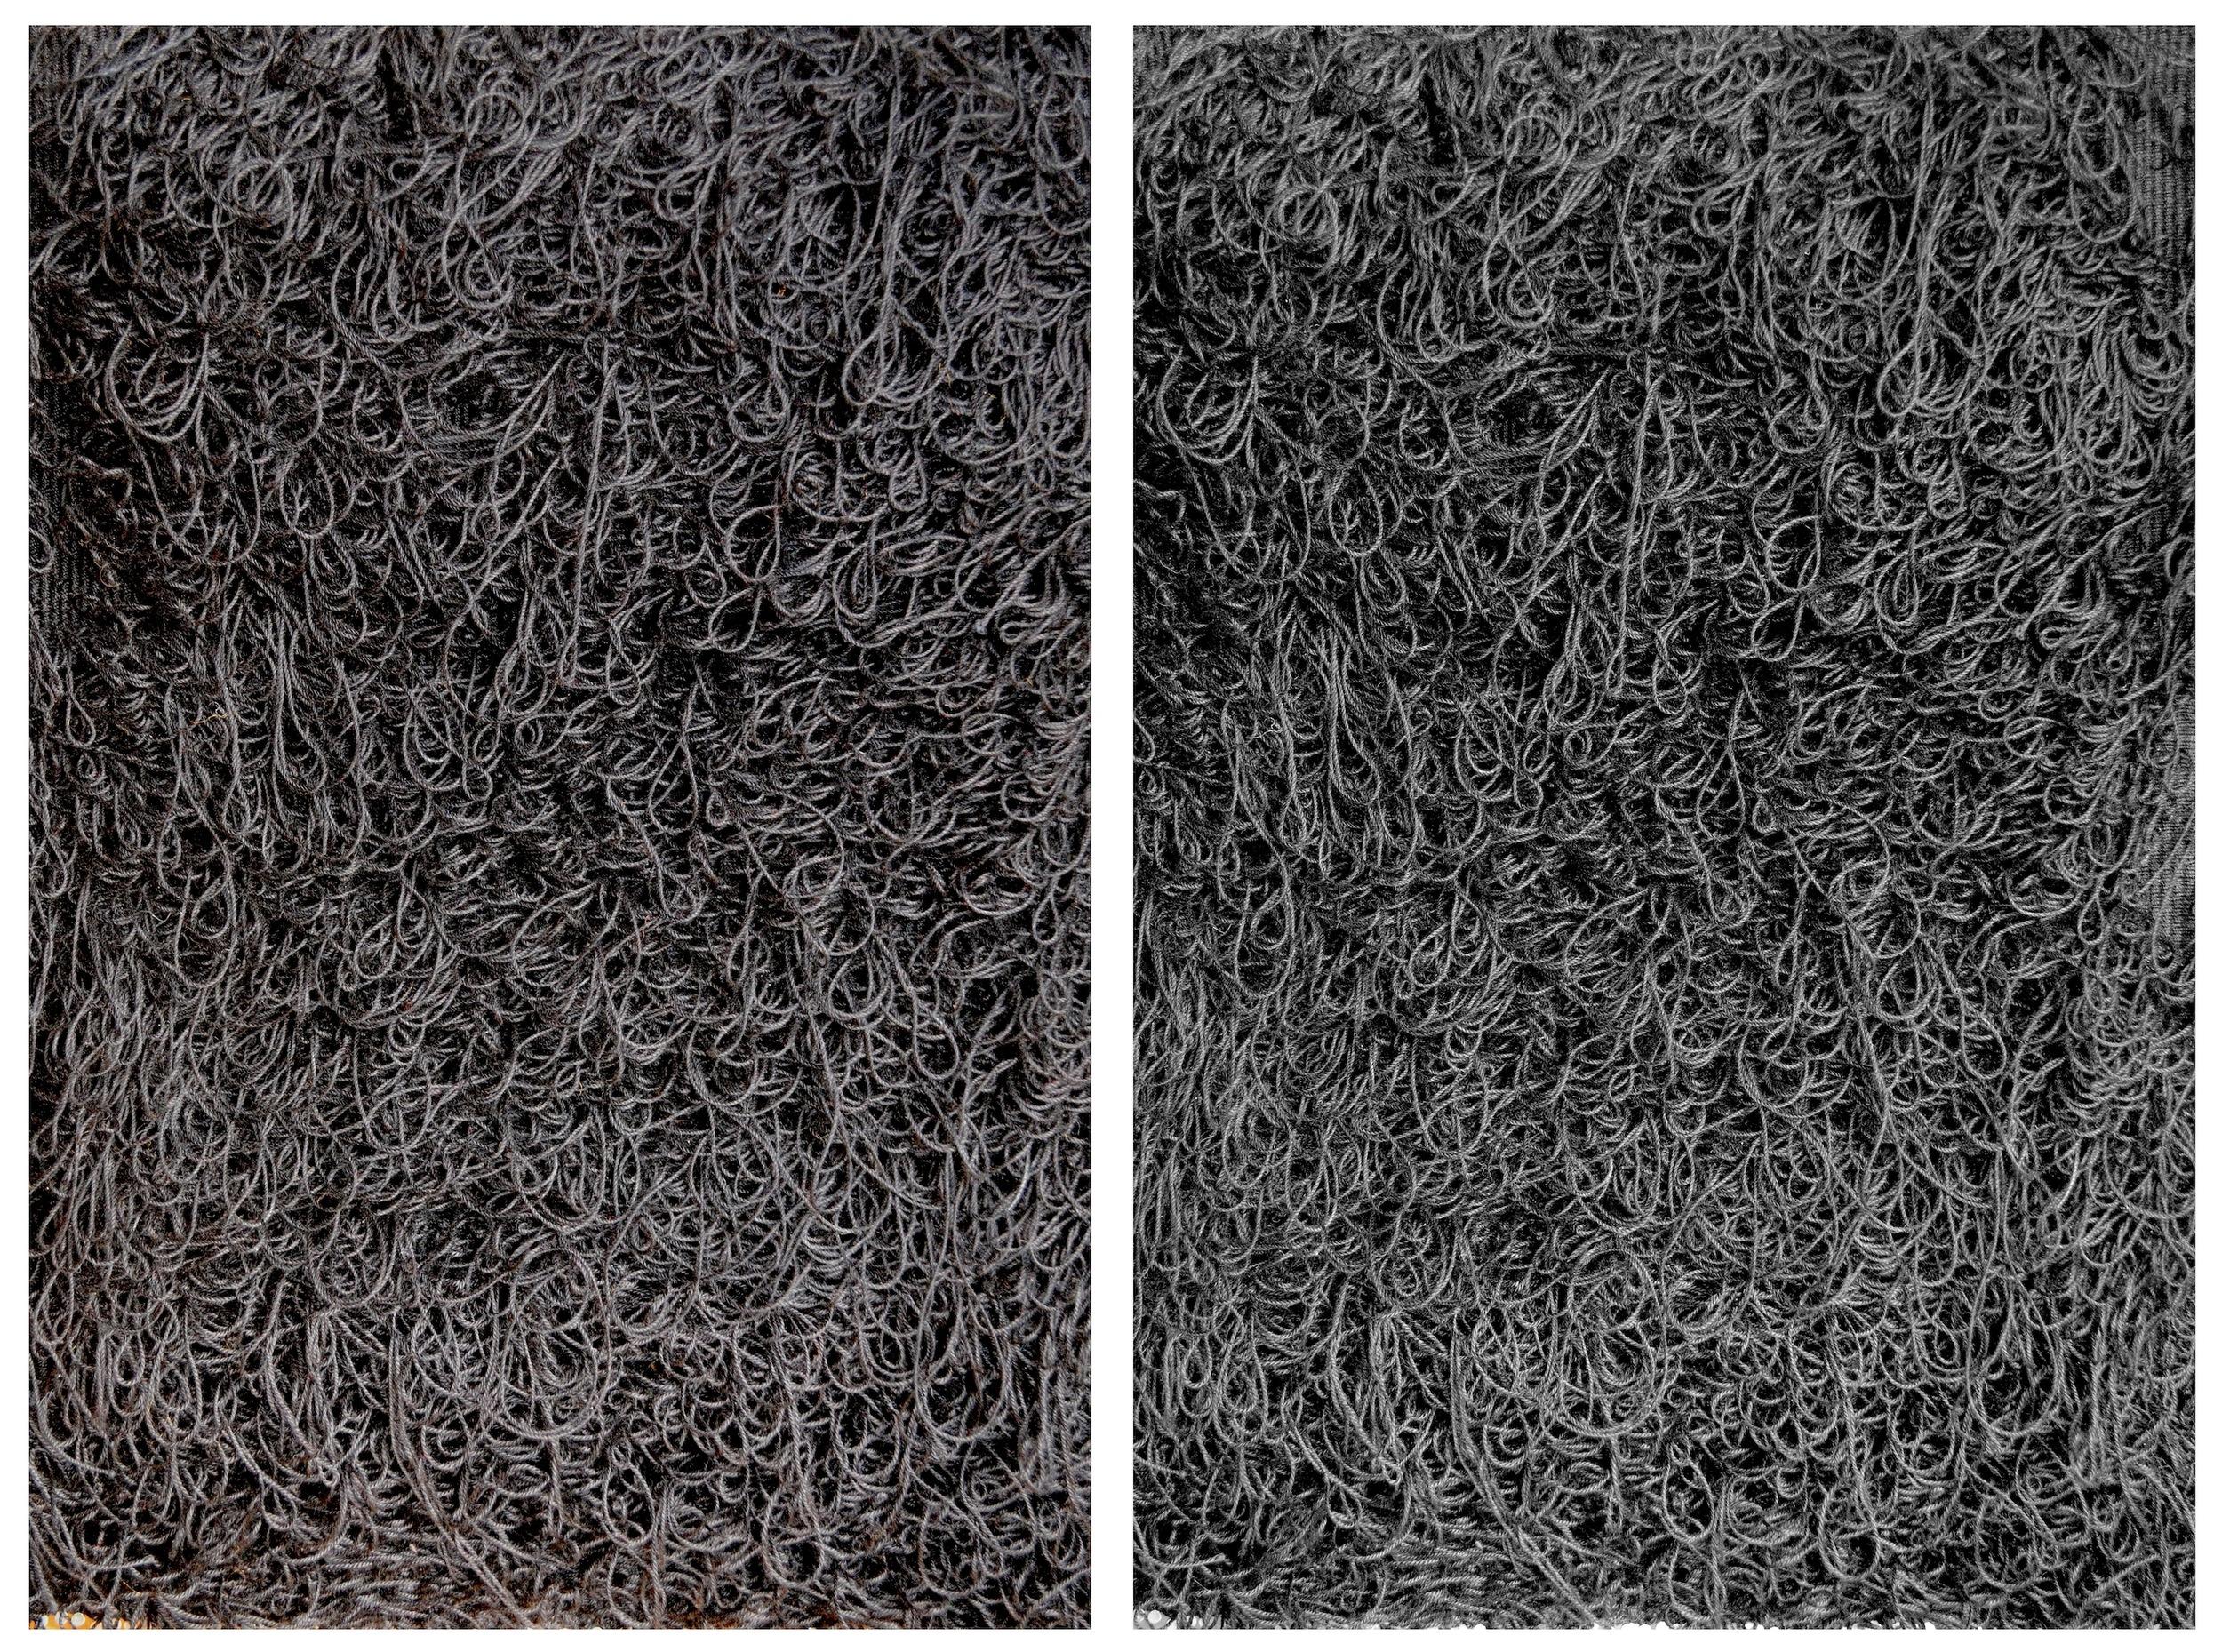 Crochet thread, wood frame, nails